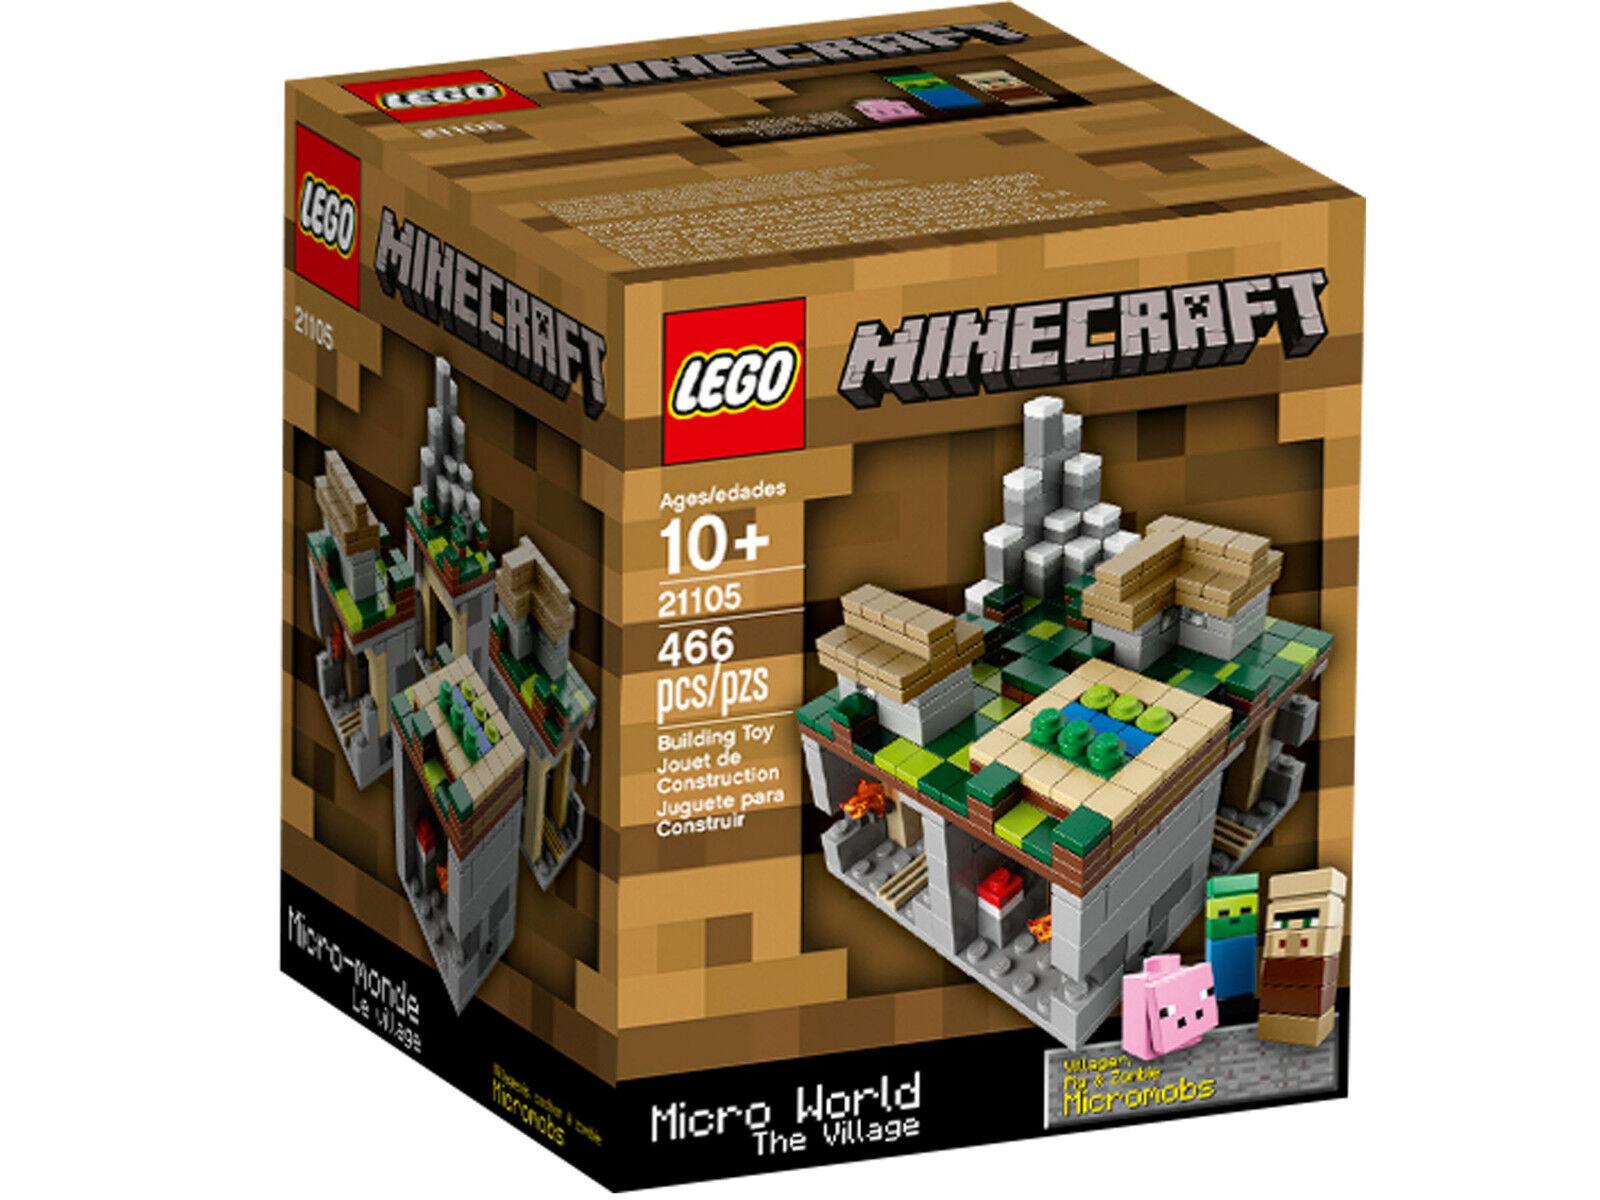 LEGO 21105 Minecraft Micro World - The Village - Ideas Cuusoo Dorf Steve Creeper